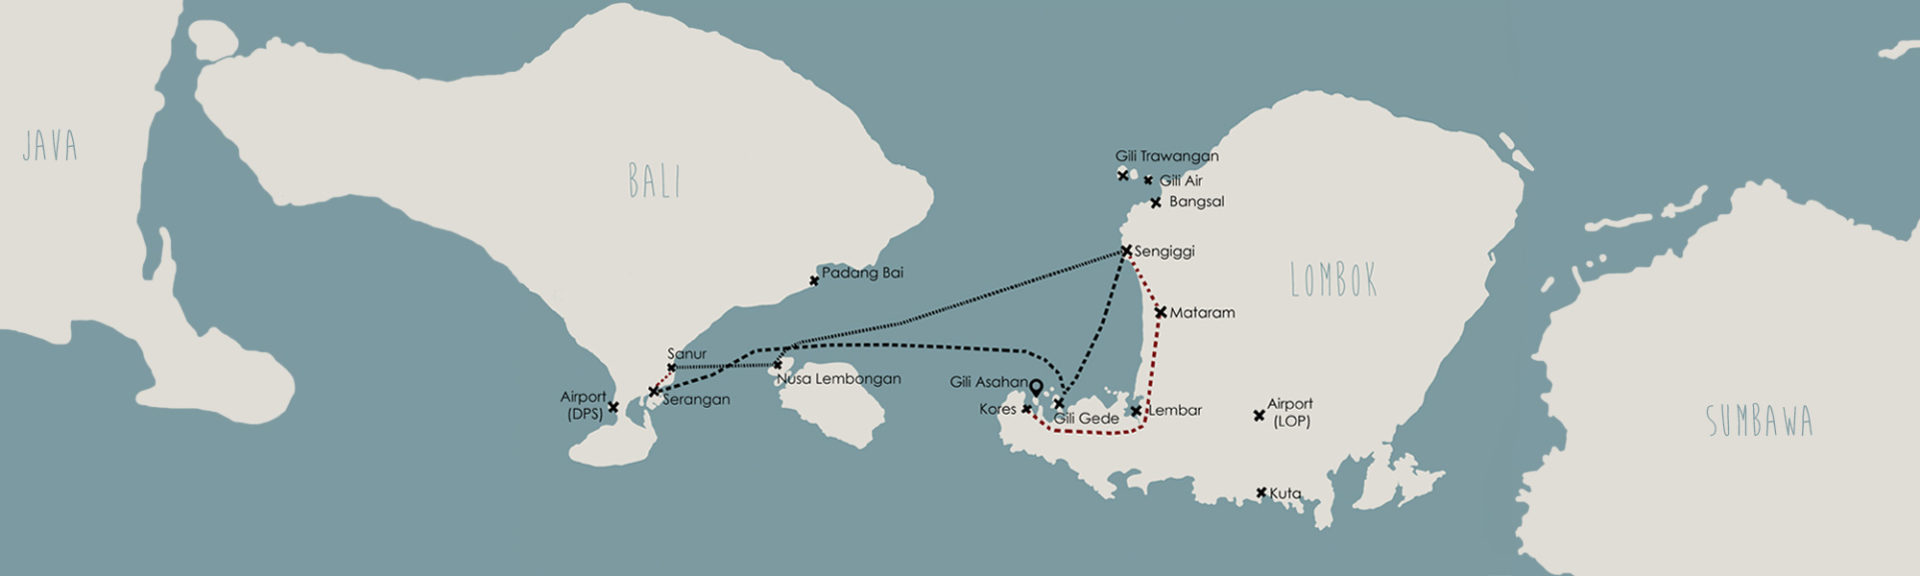 Carte Java Bali Lombok.Fast Boat Lembongan Gili Asahan Eco Lodge Restaurant